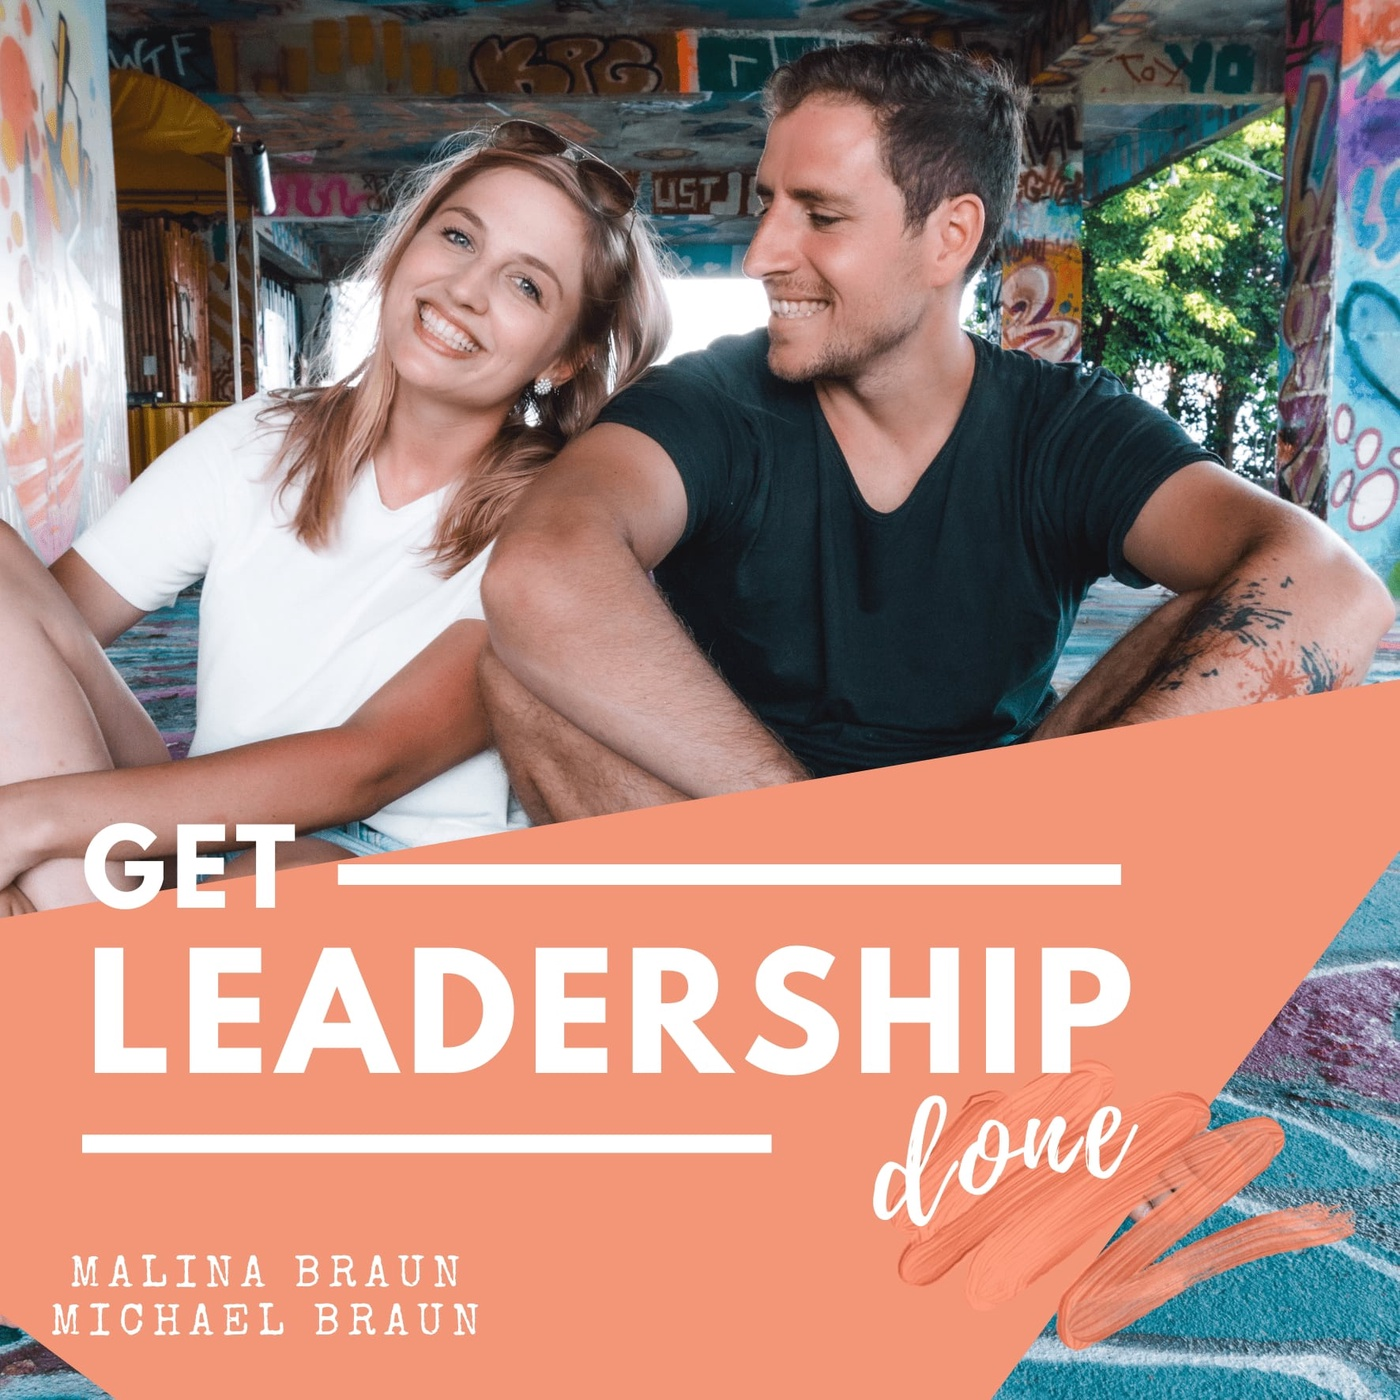 Get Leadership done! - Führungsimpulse